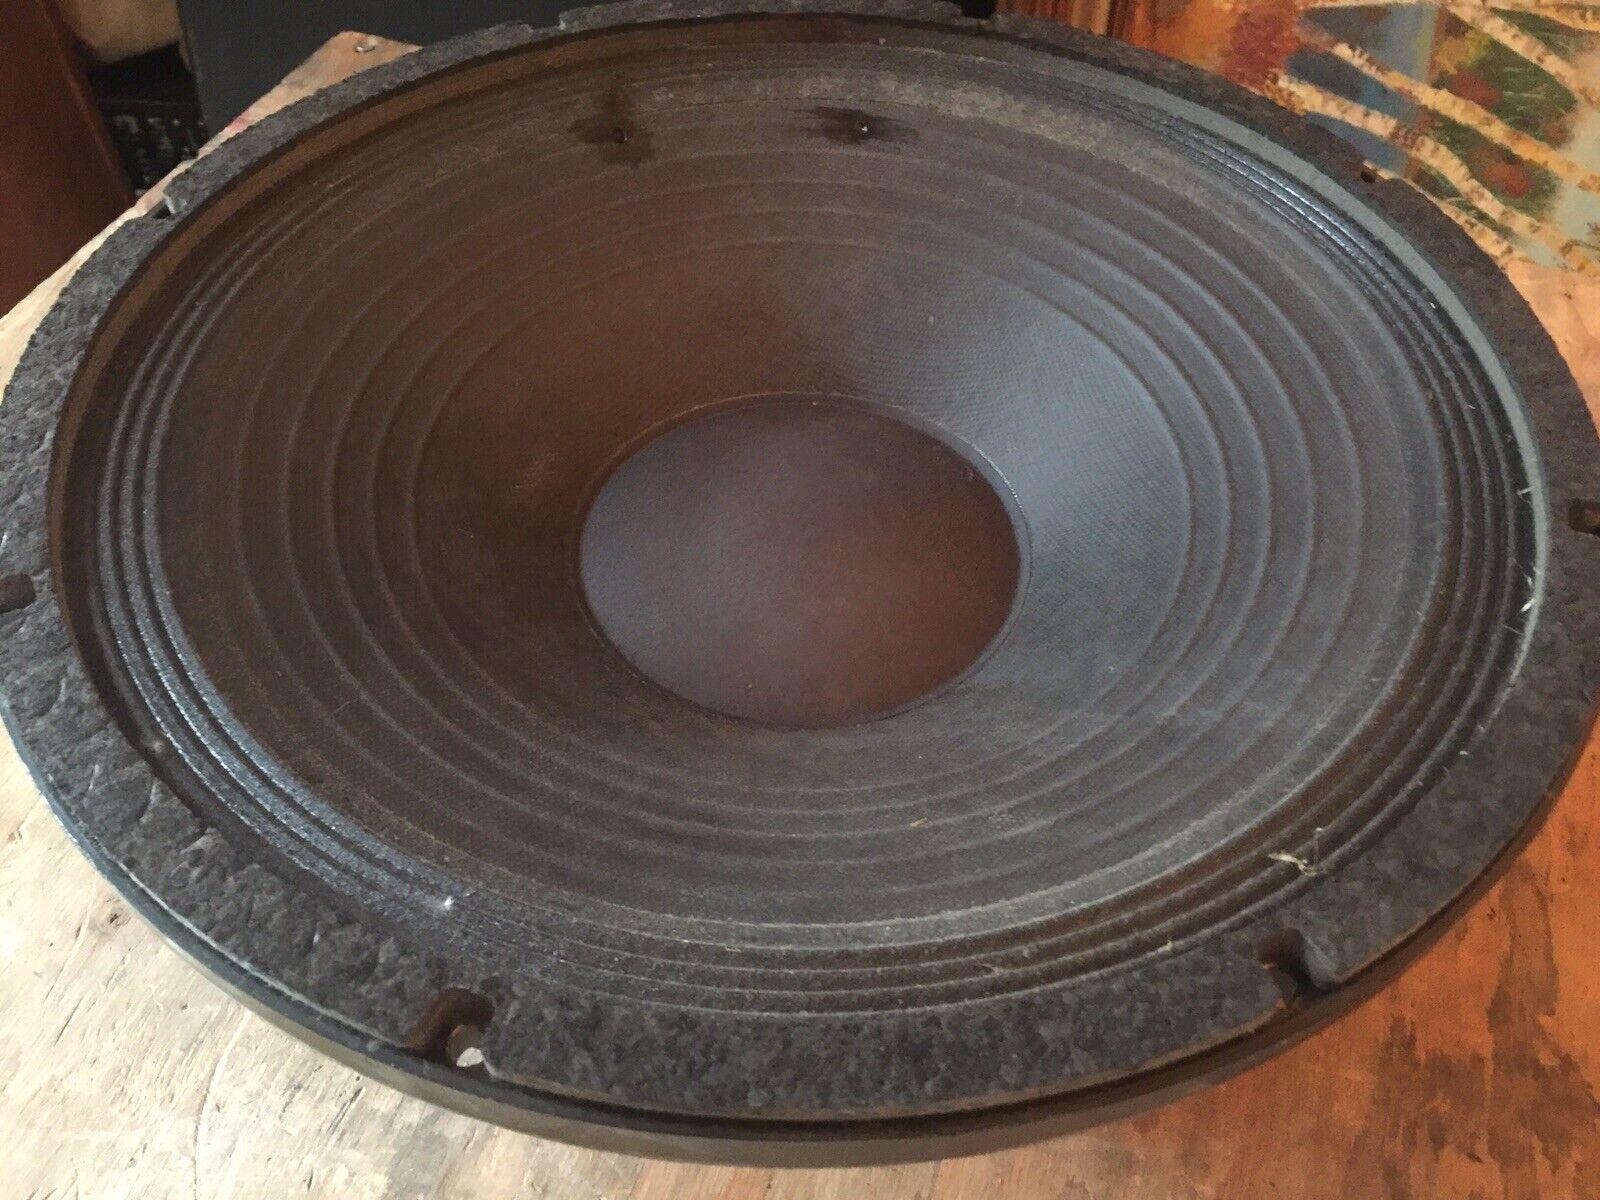 Emience 86-524-04 15  Bass Speaker for AMPEG 115 Cab